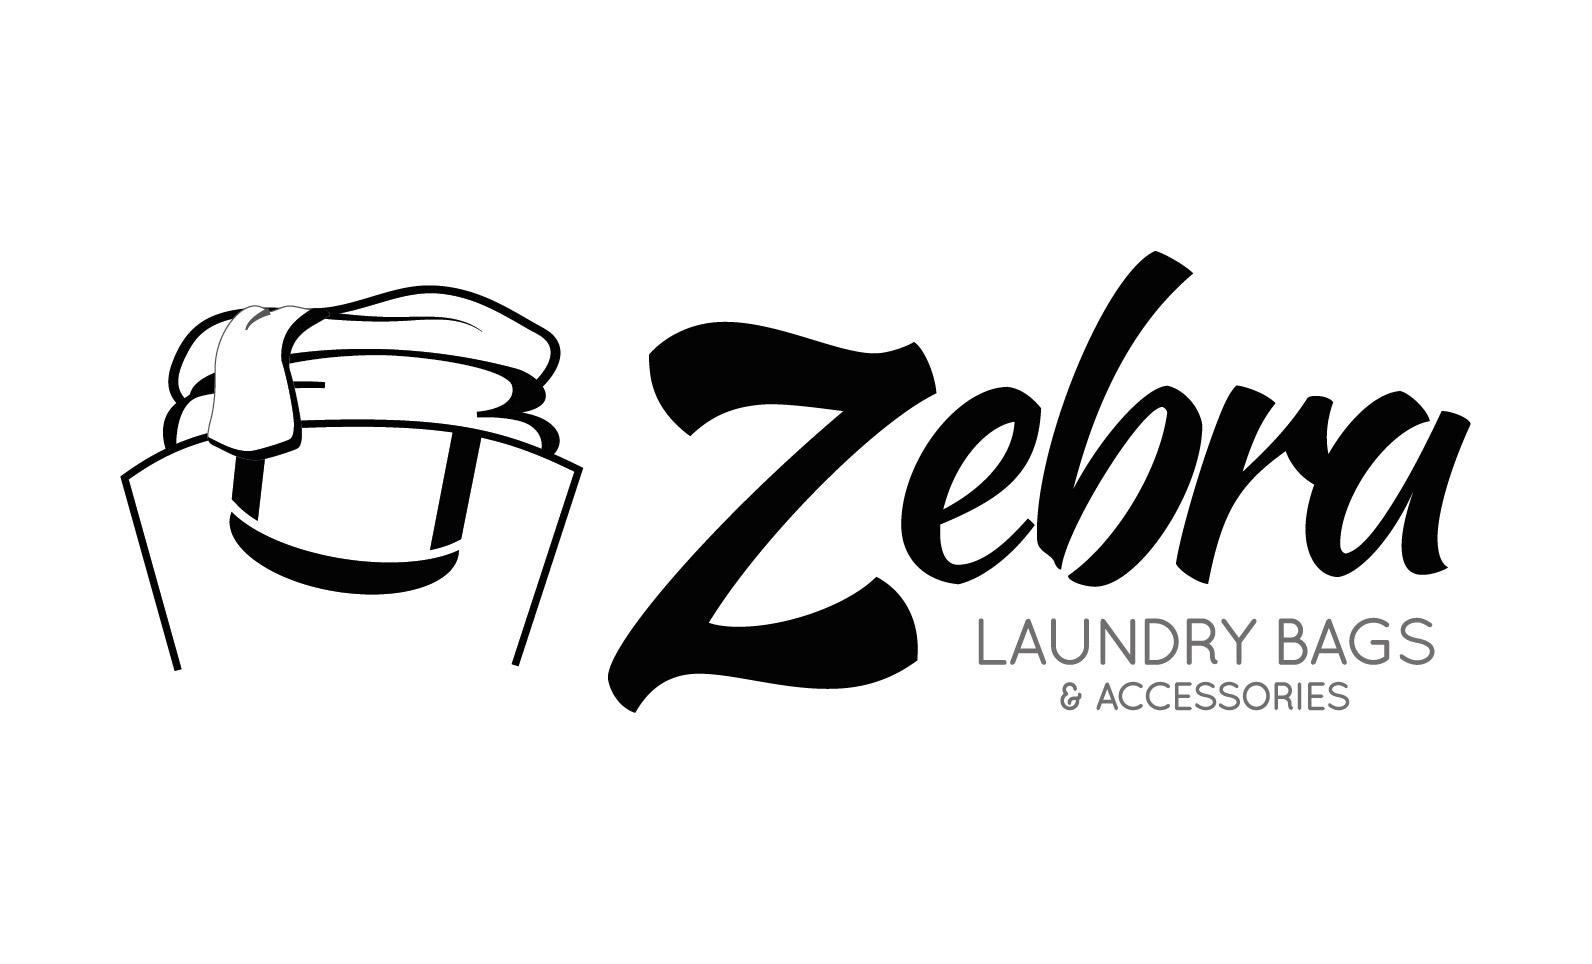 Zebra Laundrybags - Tienda online